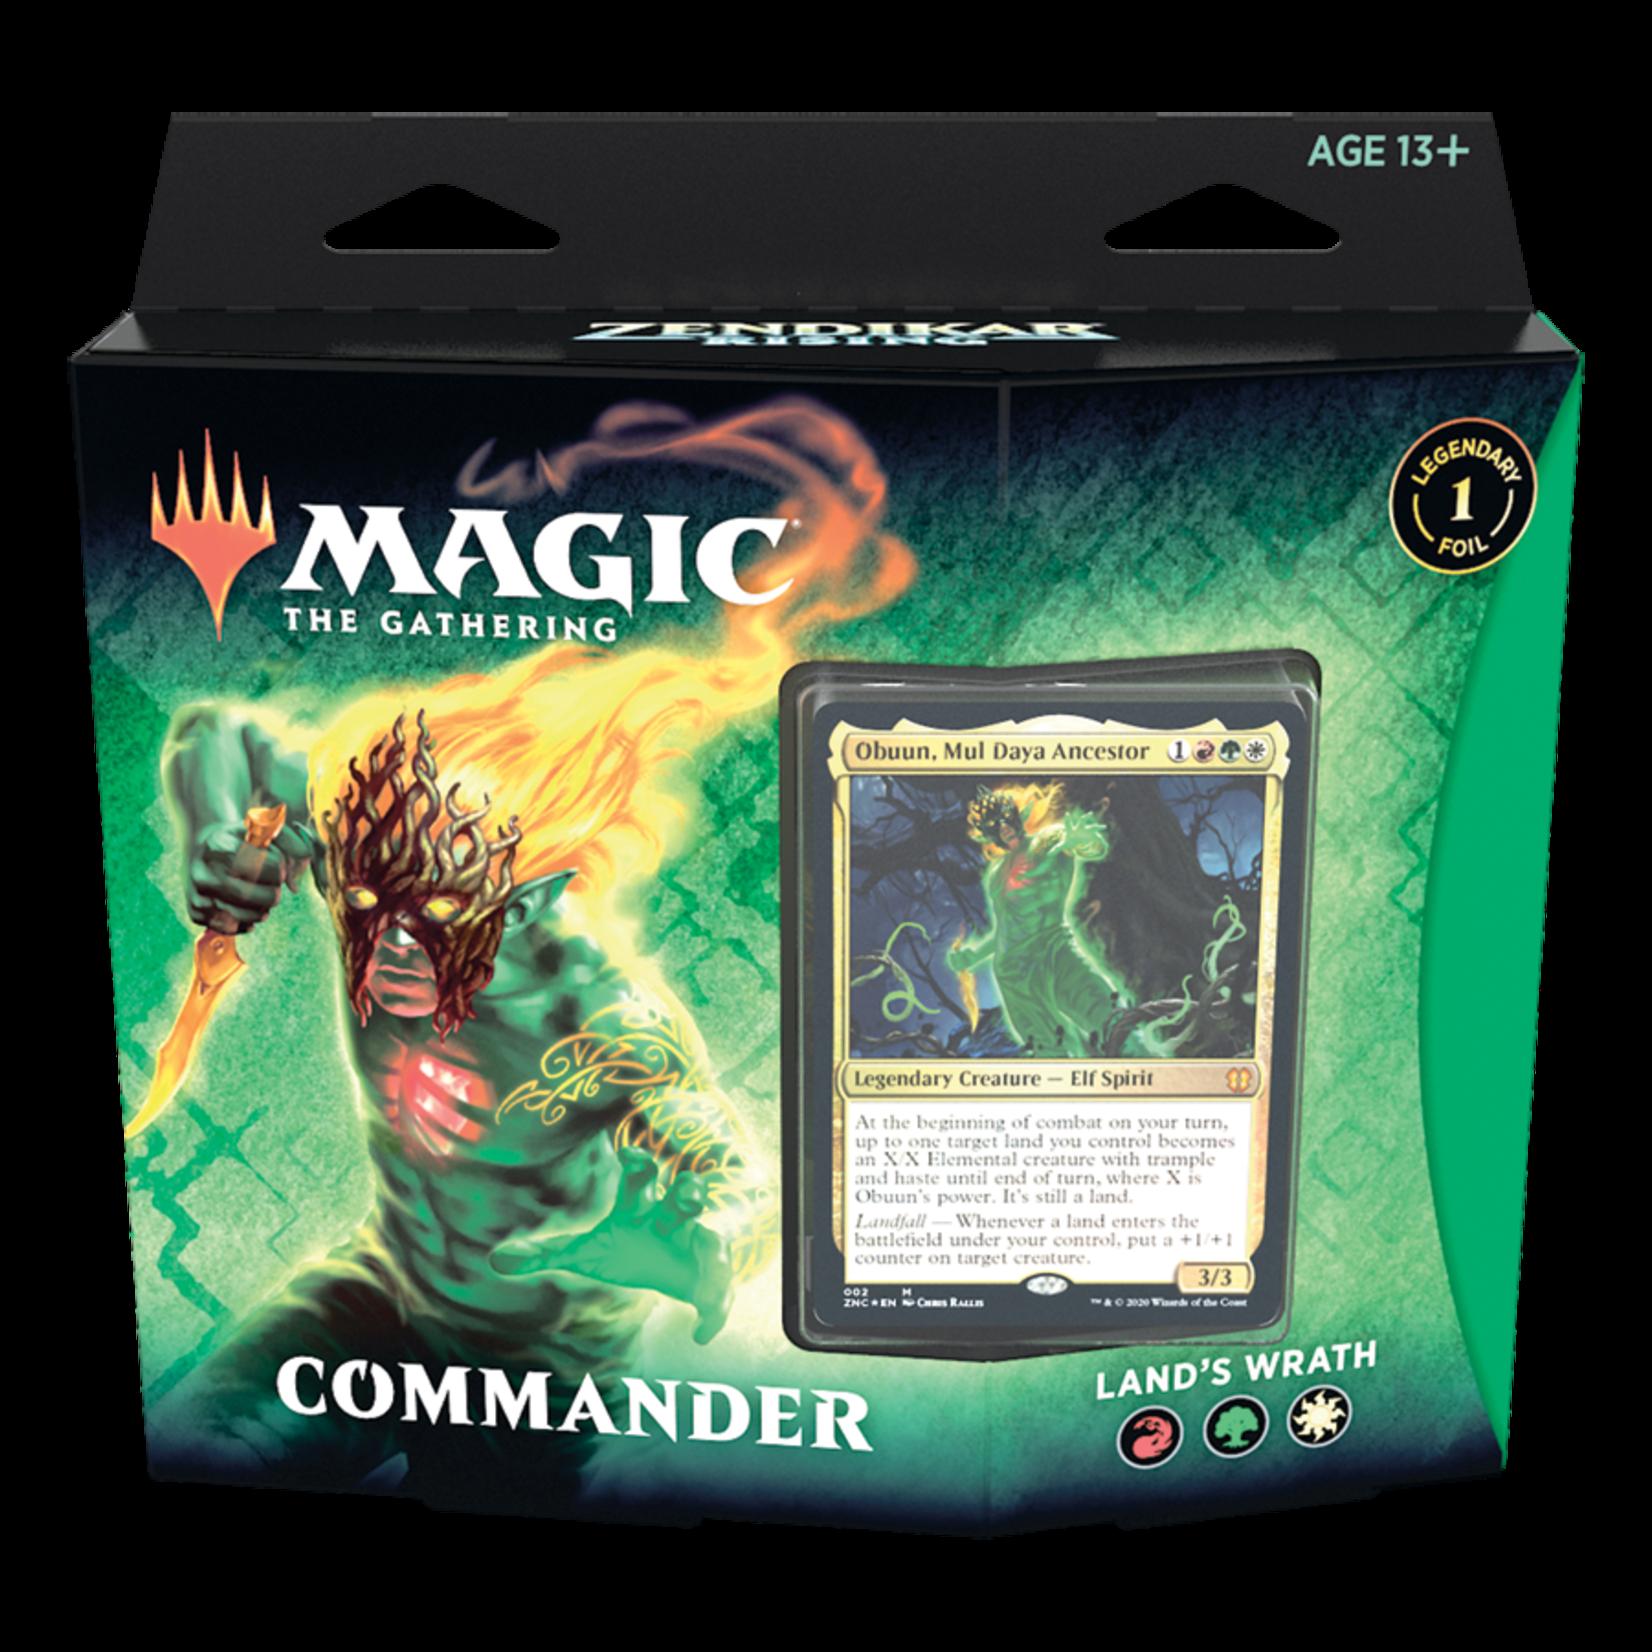 Magic: The Gathering Magic: The Gathering - Zendikar Rising Commander Deck: Land's Wrath